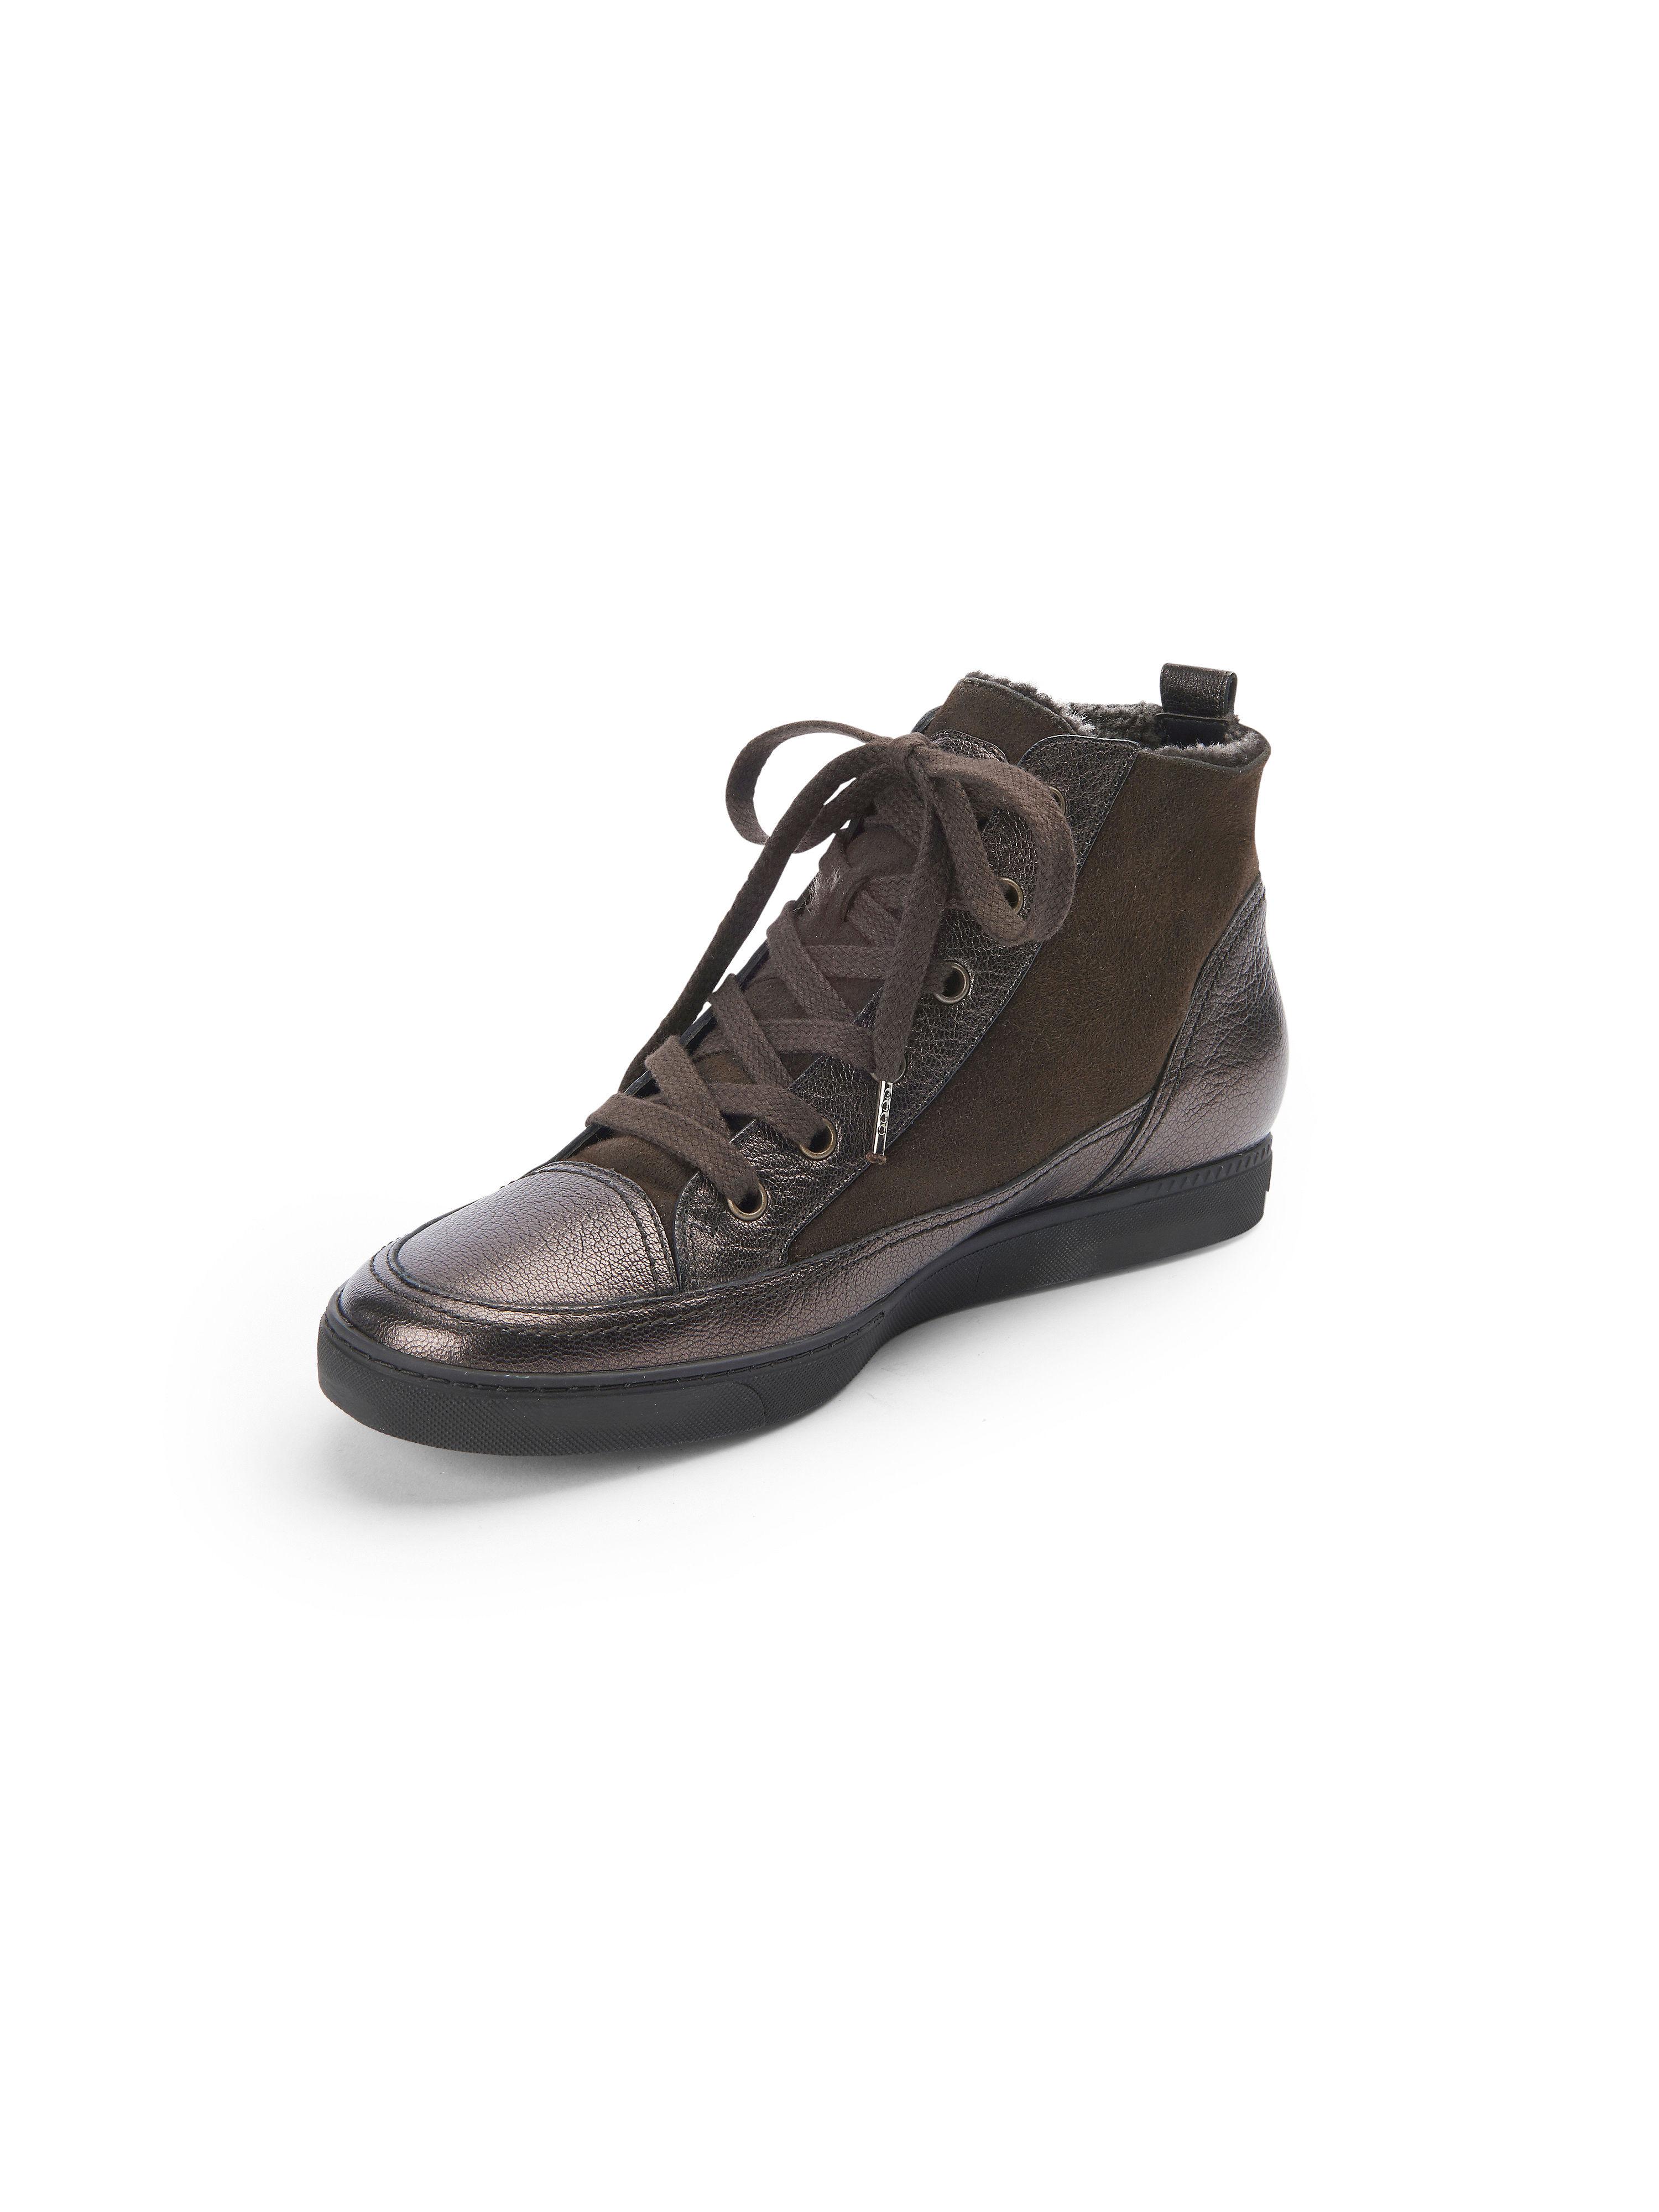 Sneakers Van bruin Foto's Online 2018 Nieuwe Hoge Kwaliteit Online Groothandel Kwaliteit Snel Express Hbuwh1